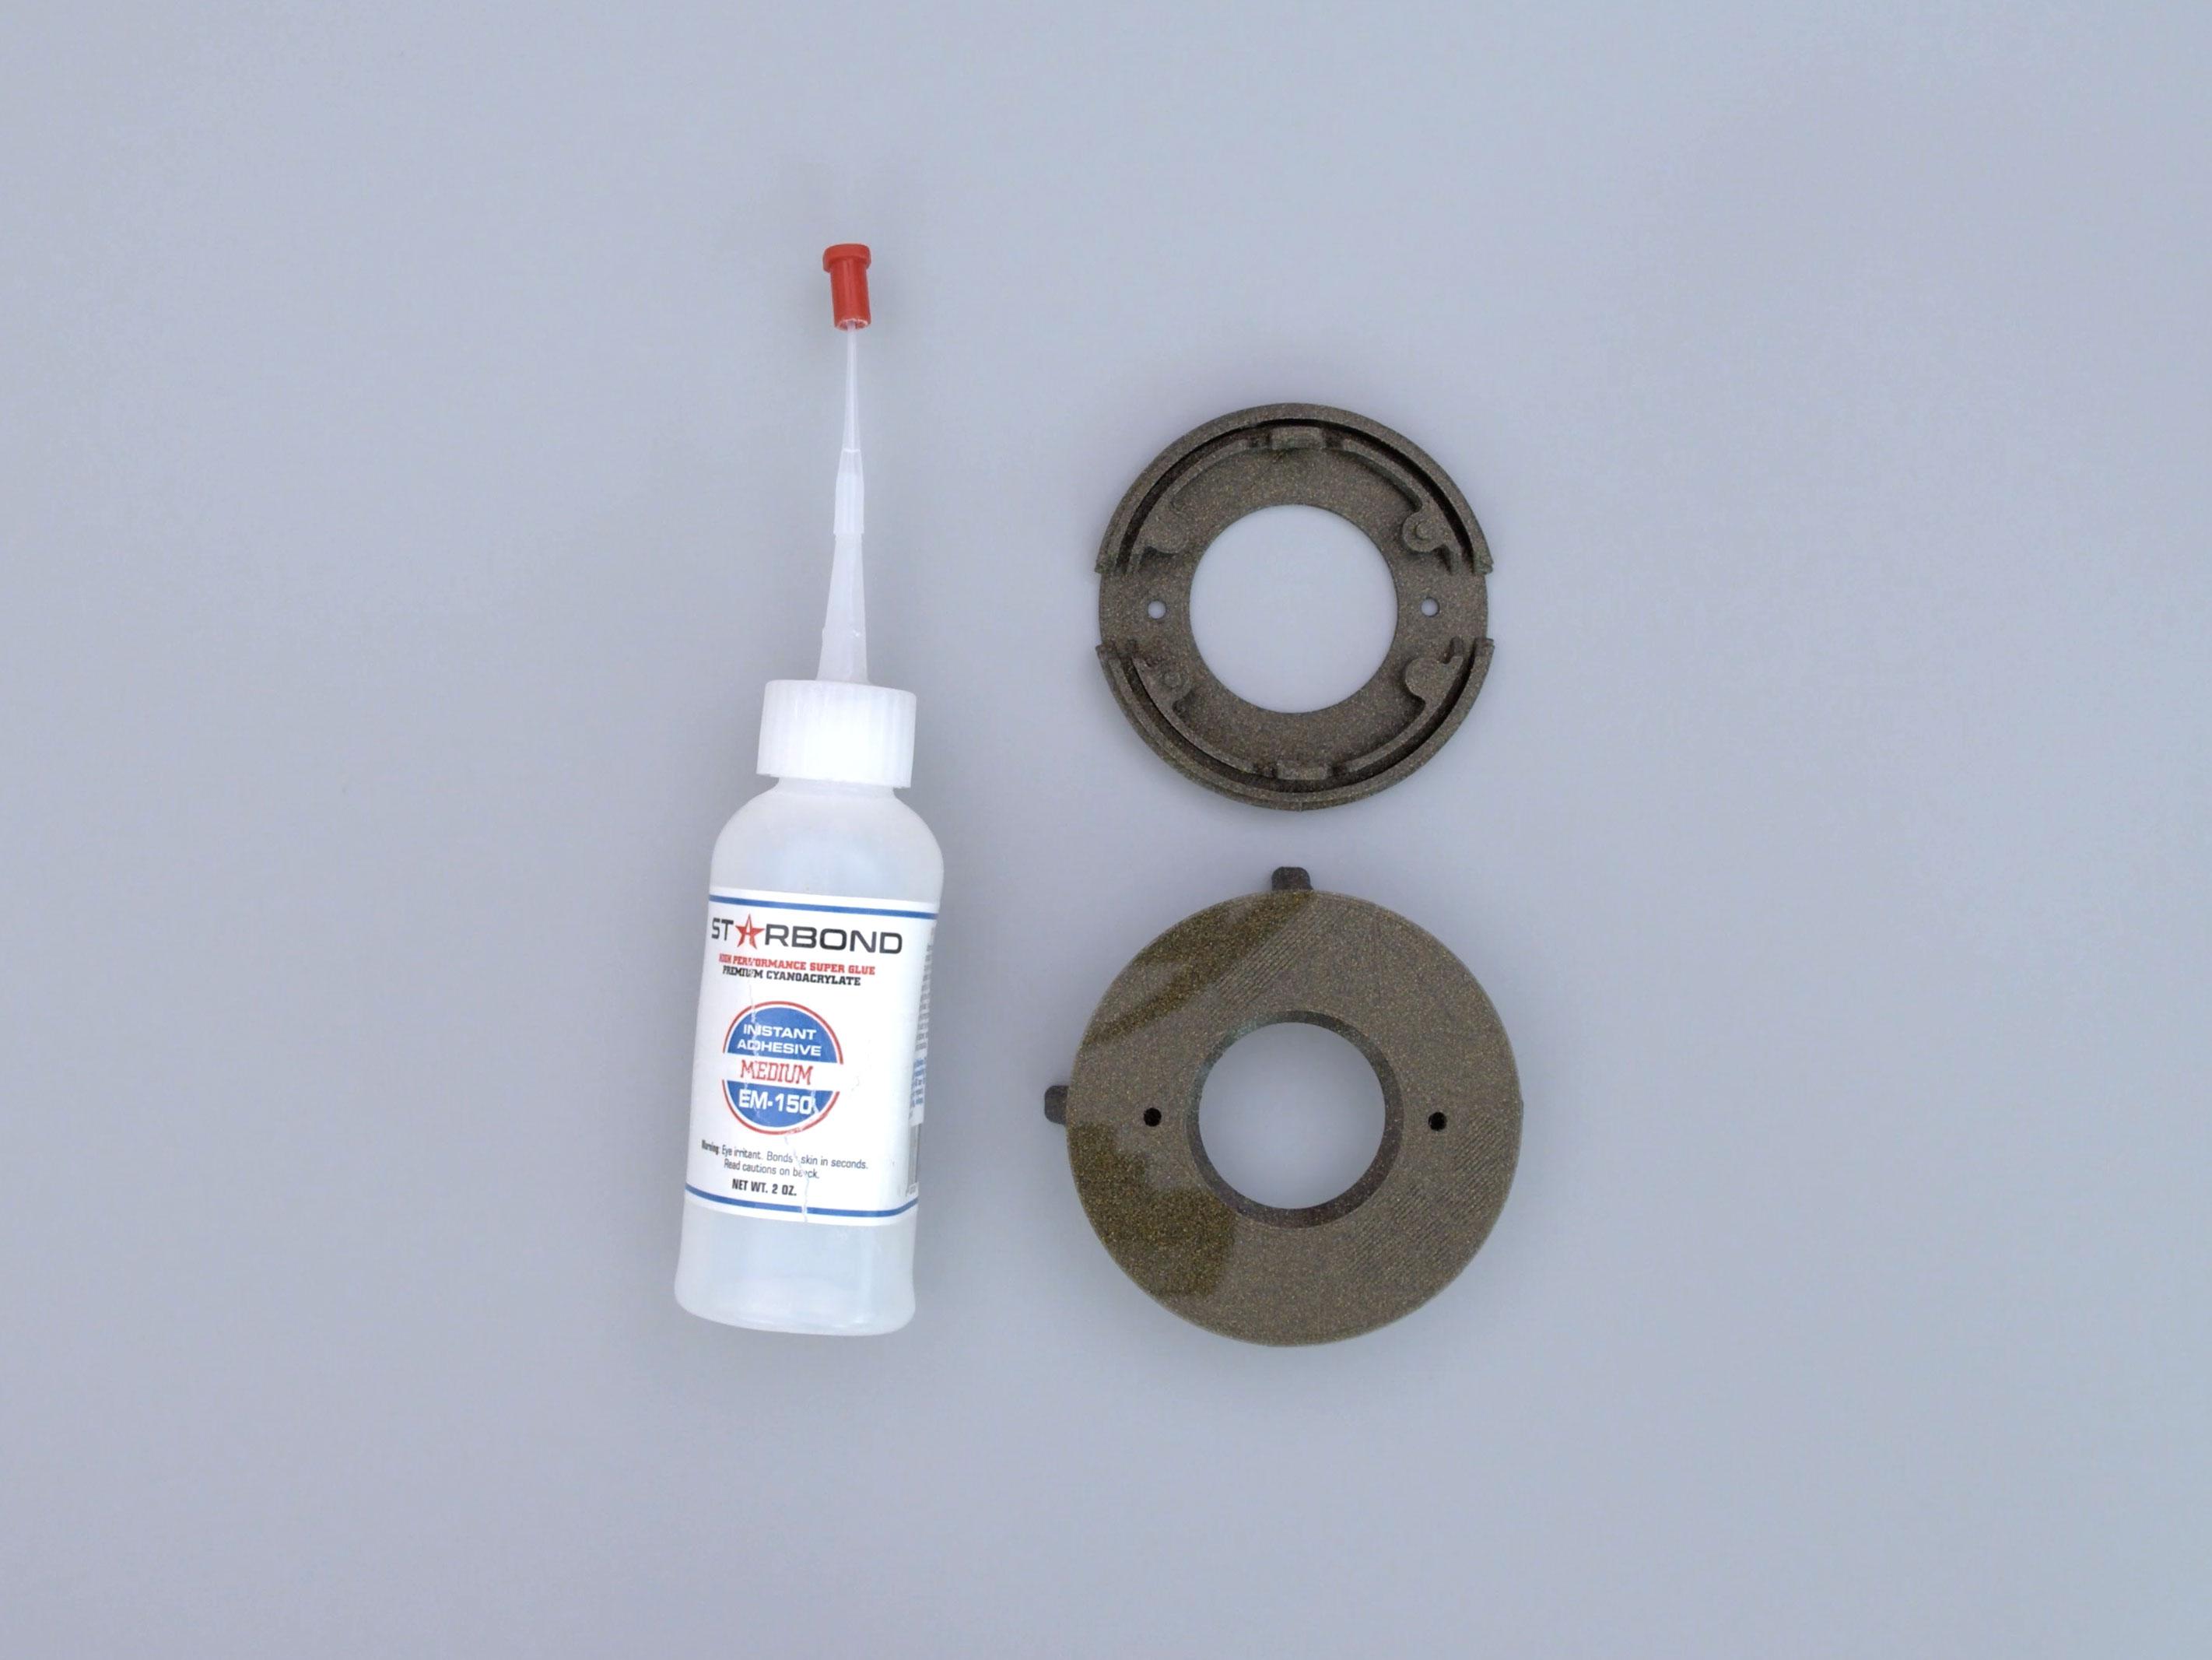 3d_printing_parts-glue.jpg